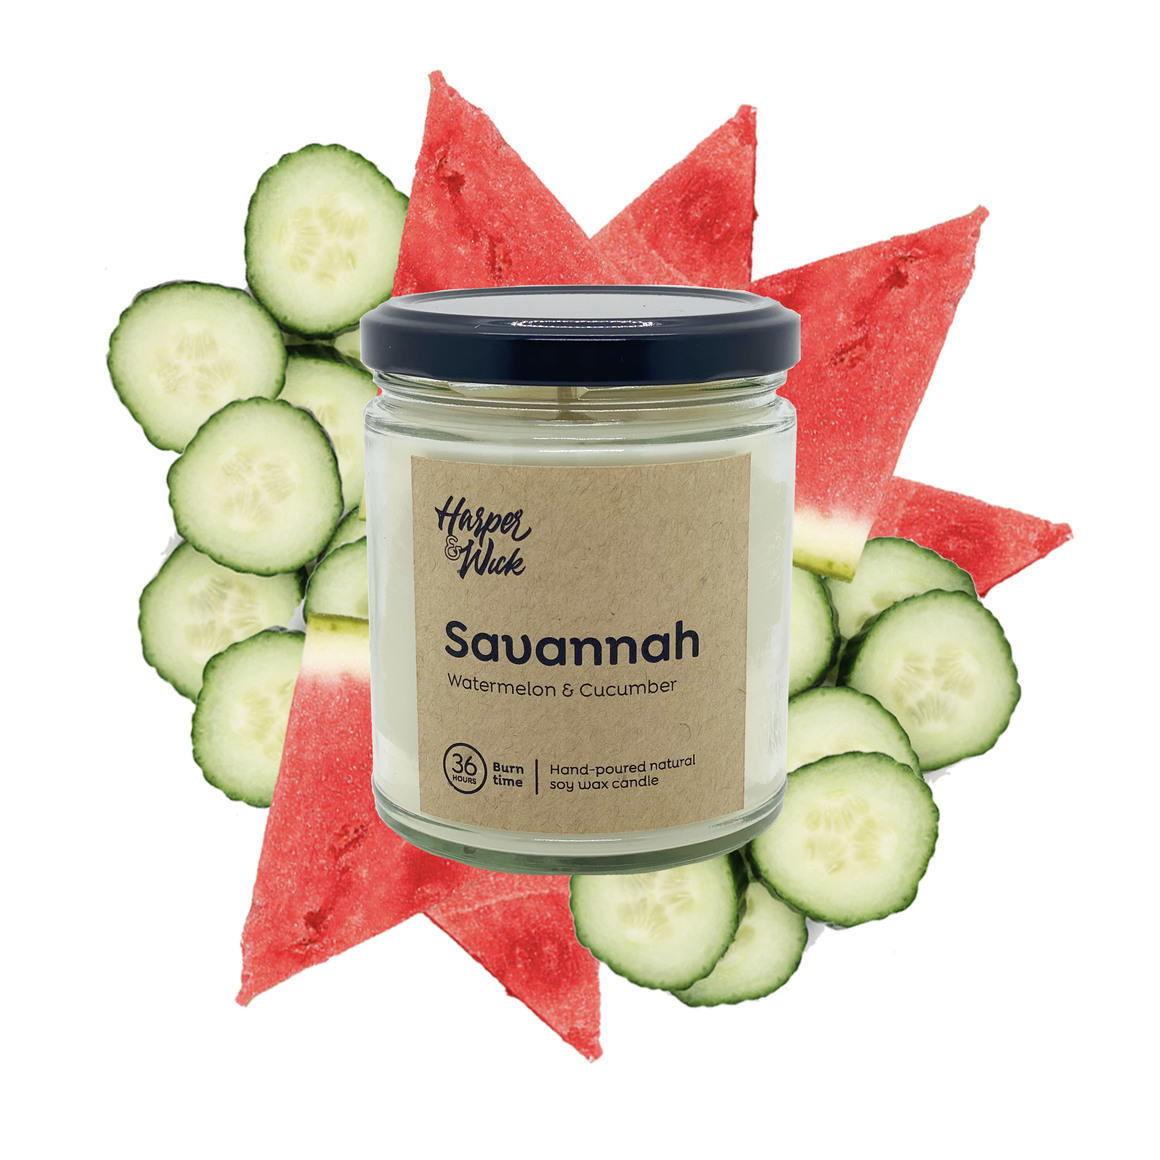 Savannah - Watermelon & Cucumber | Trada Marketplace